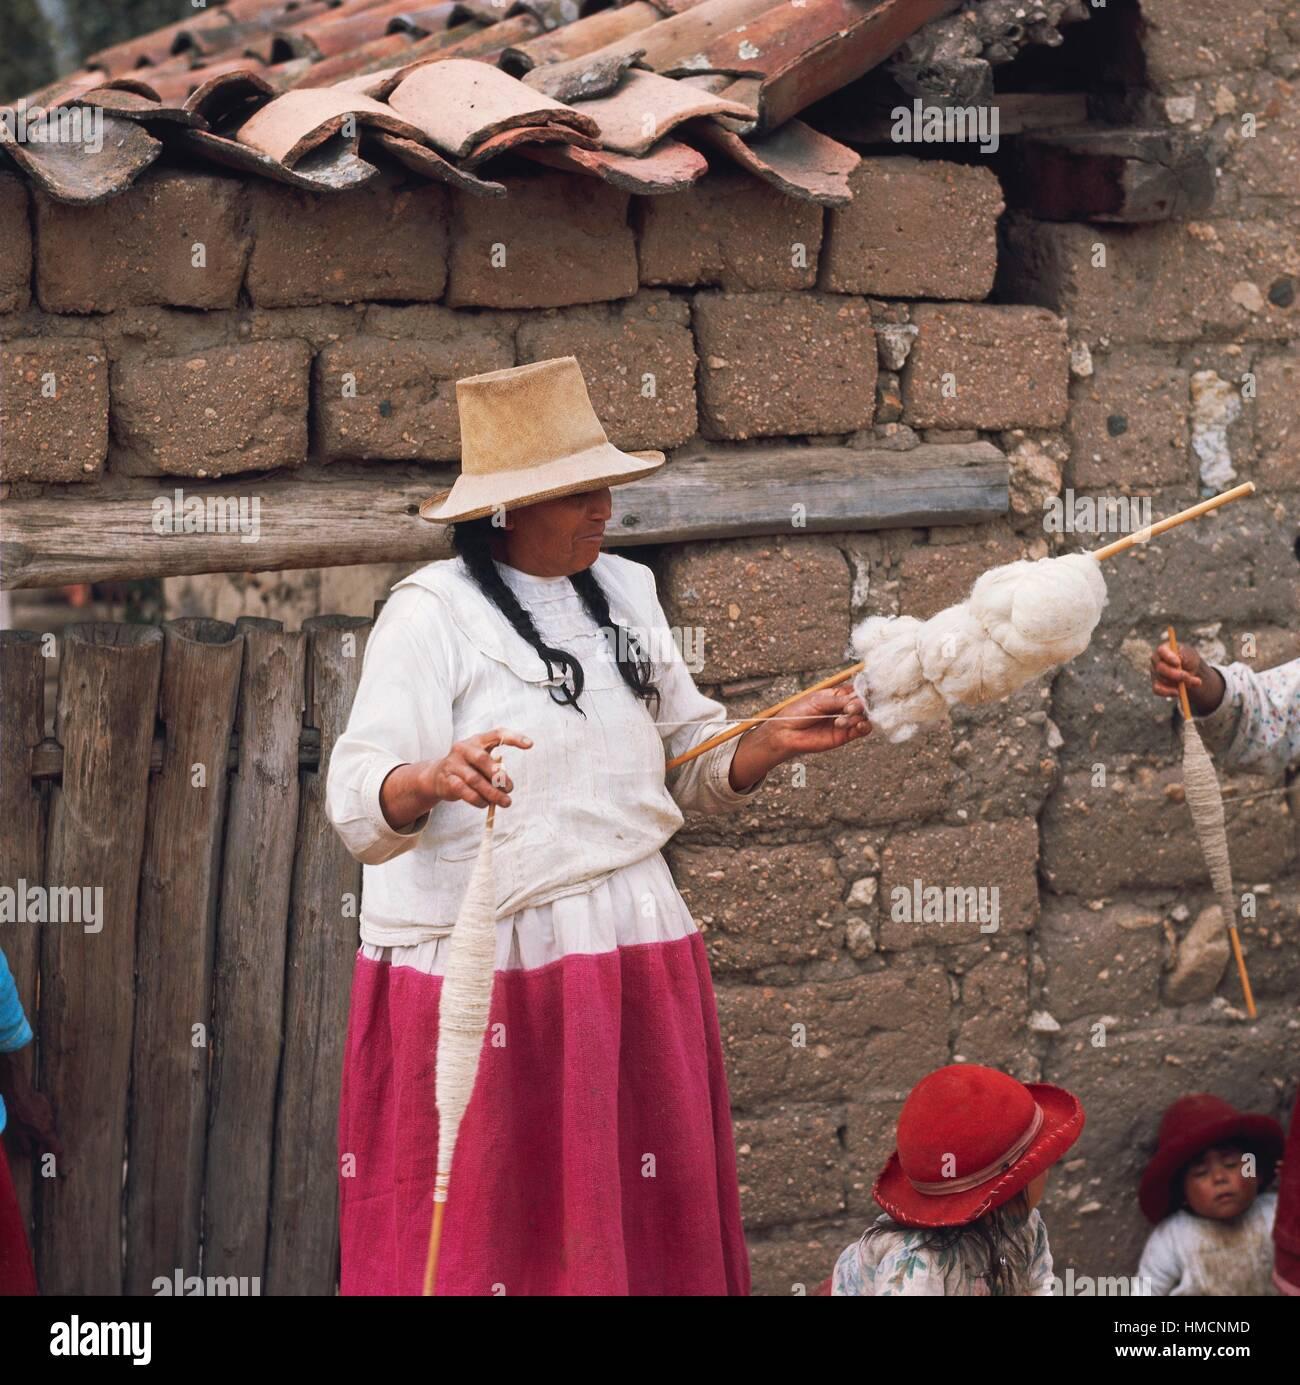 Woman spinning, Cordillera Blanca, Peru. - Stock Image